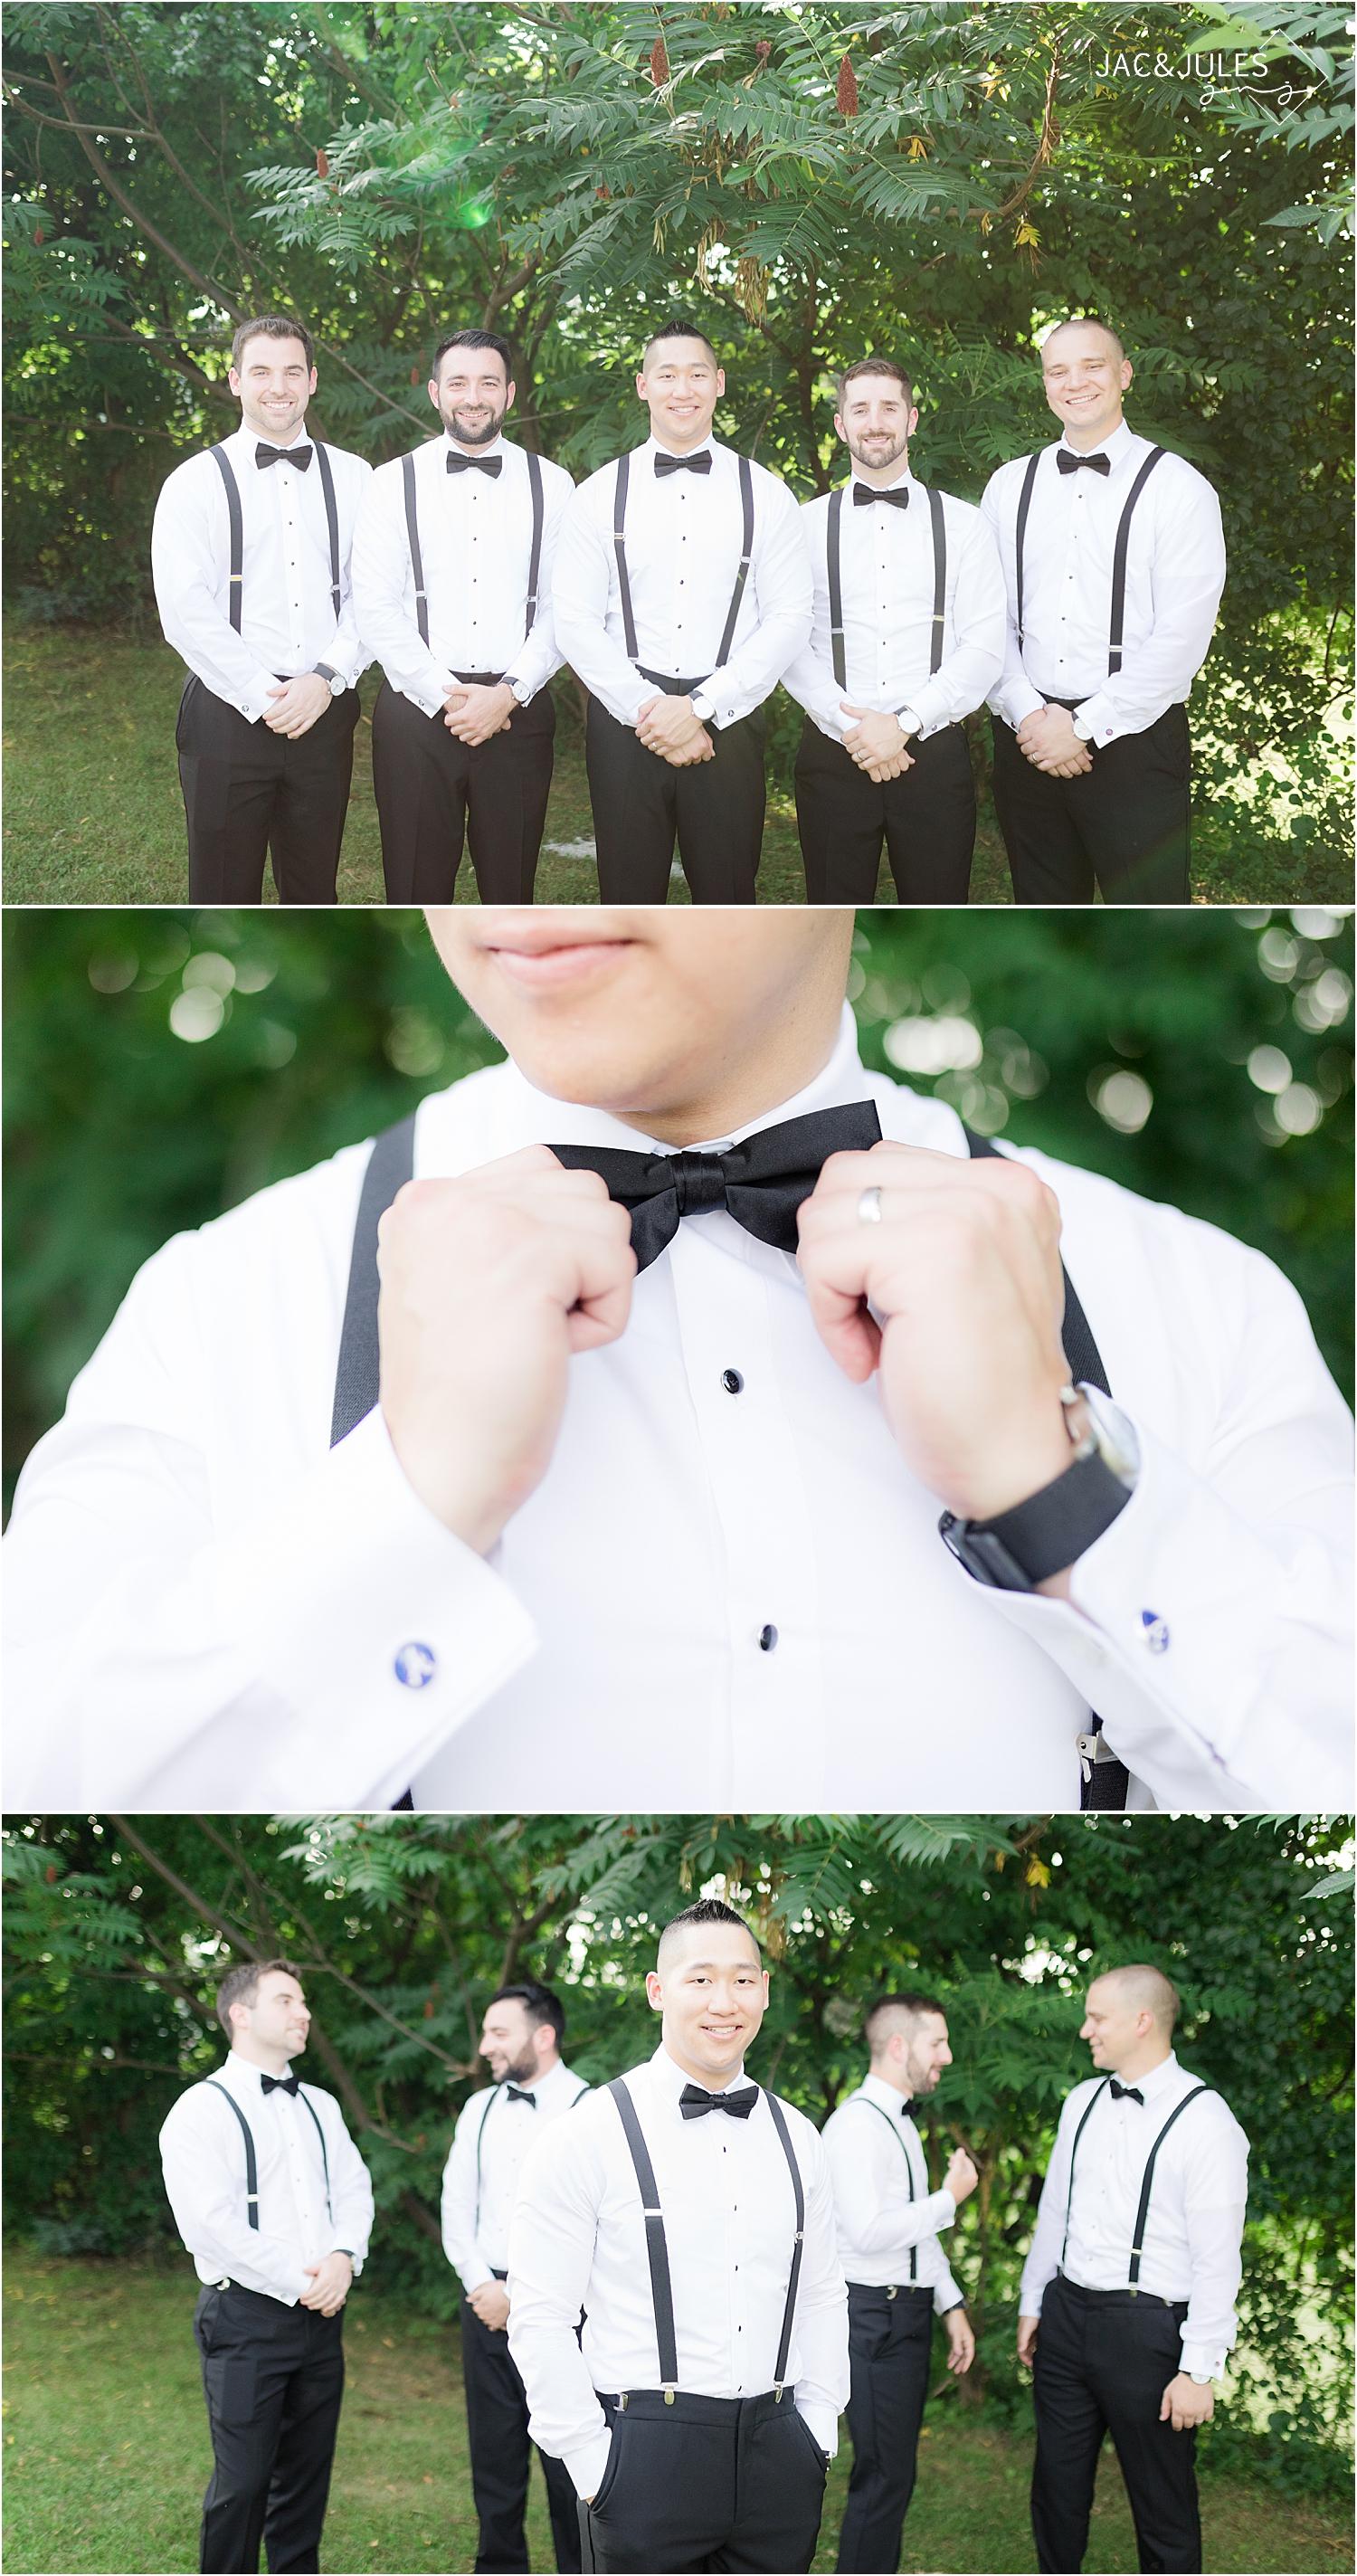 casual groomsmen photos at Skyview Golf Club